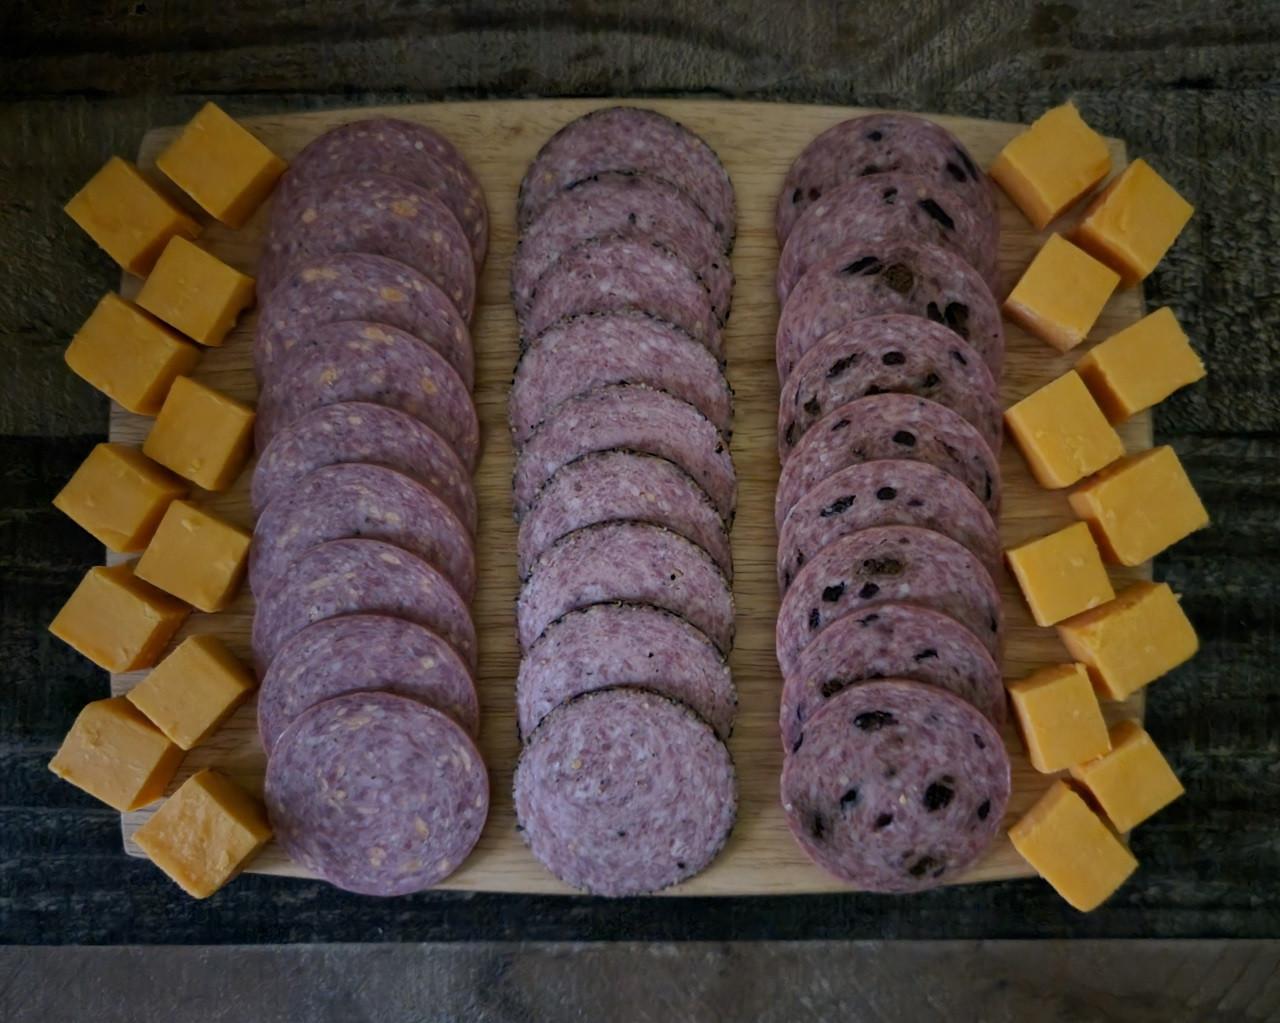 Silver Creek Summer Sausage Sampler